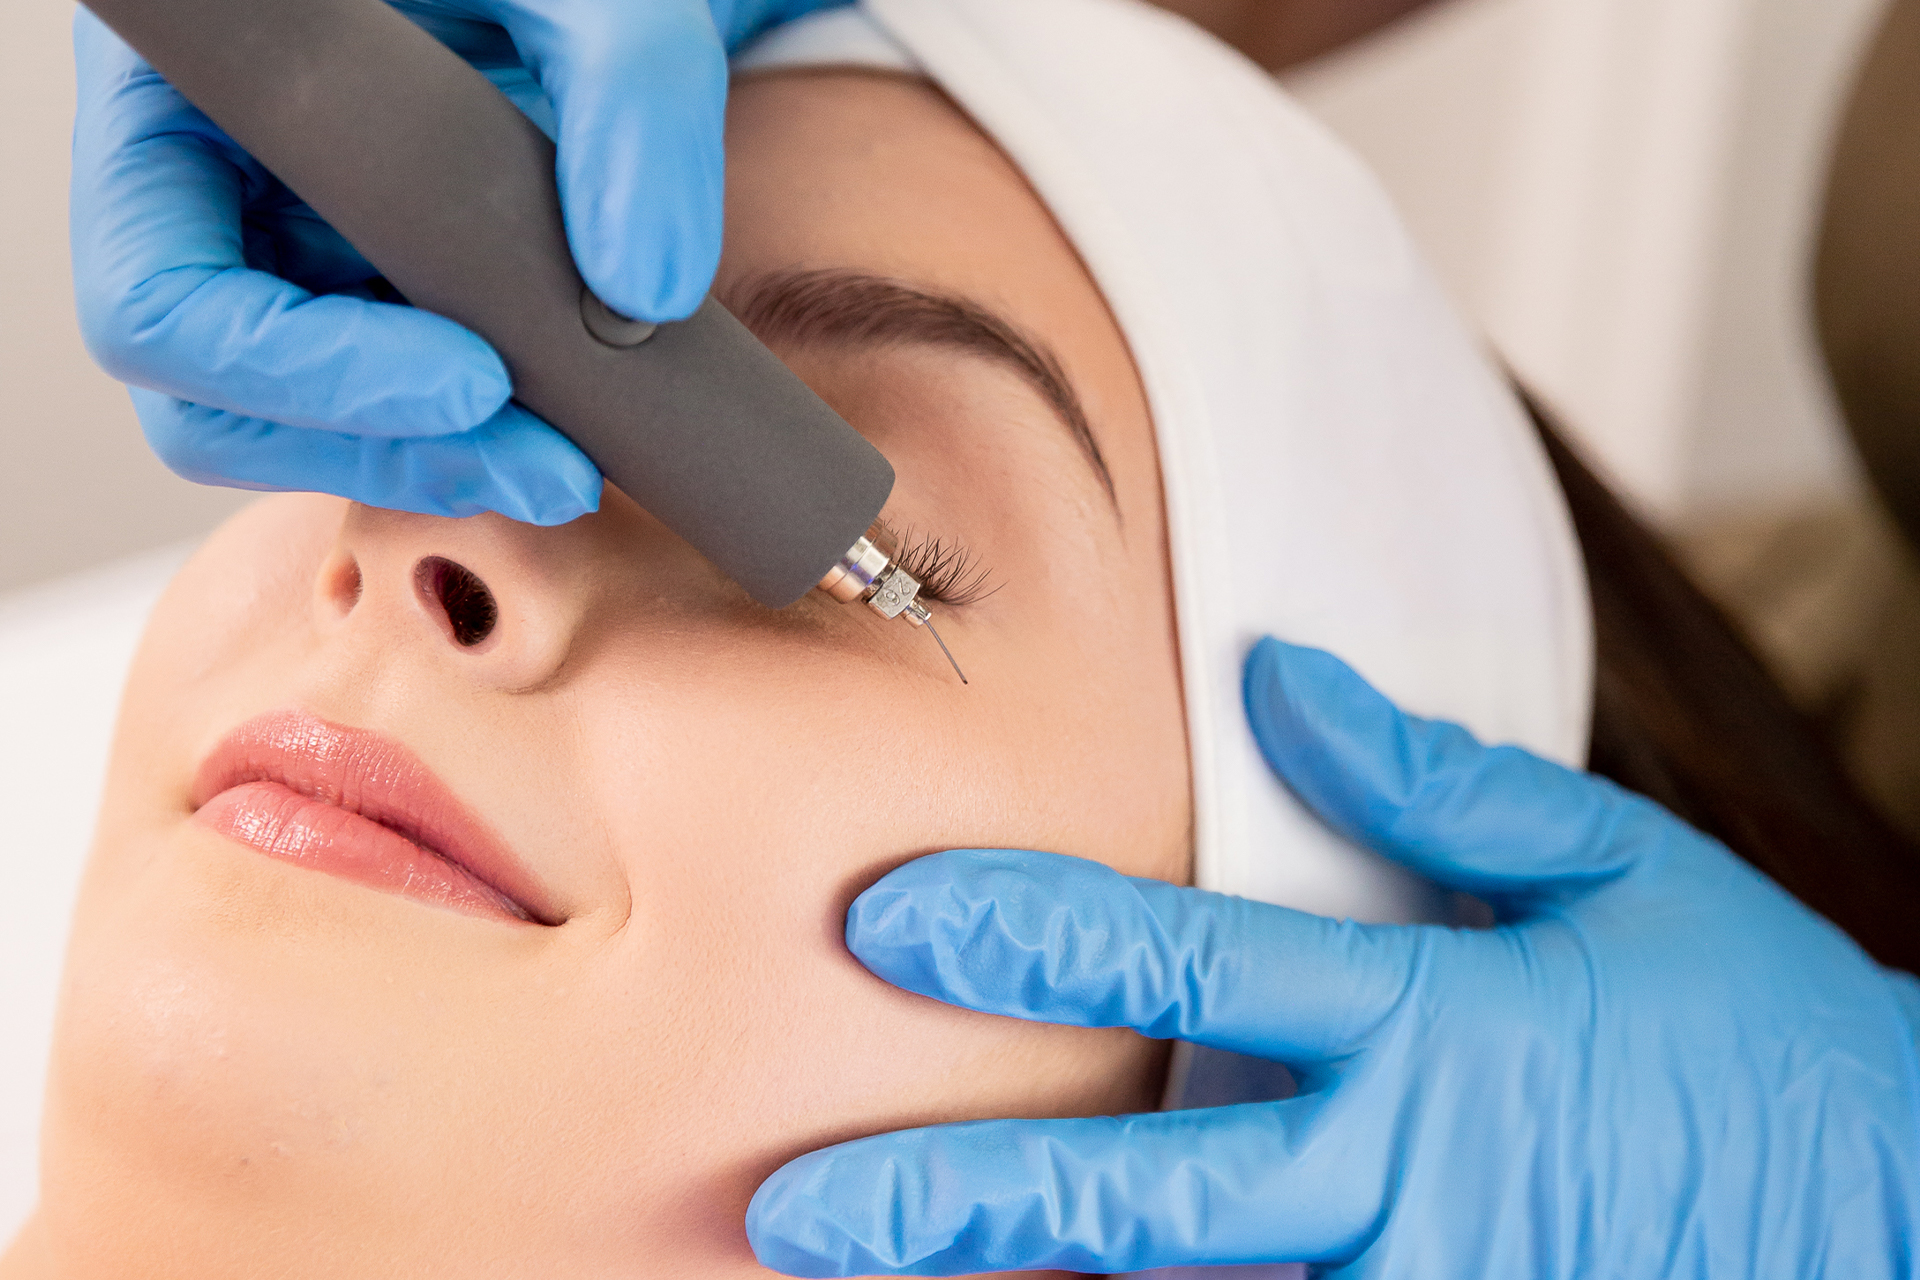 subnovii plasma pen treatment